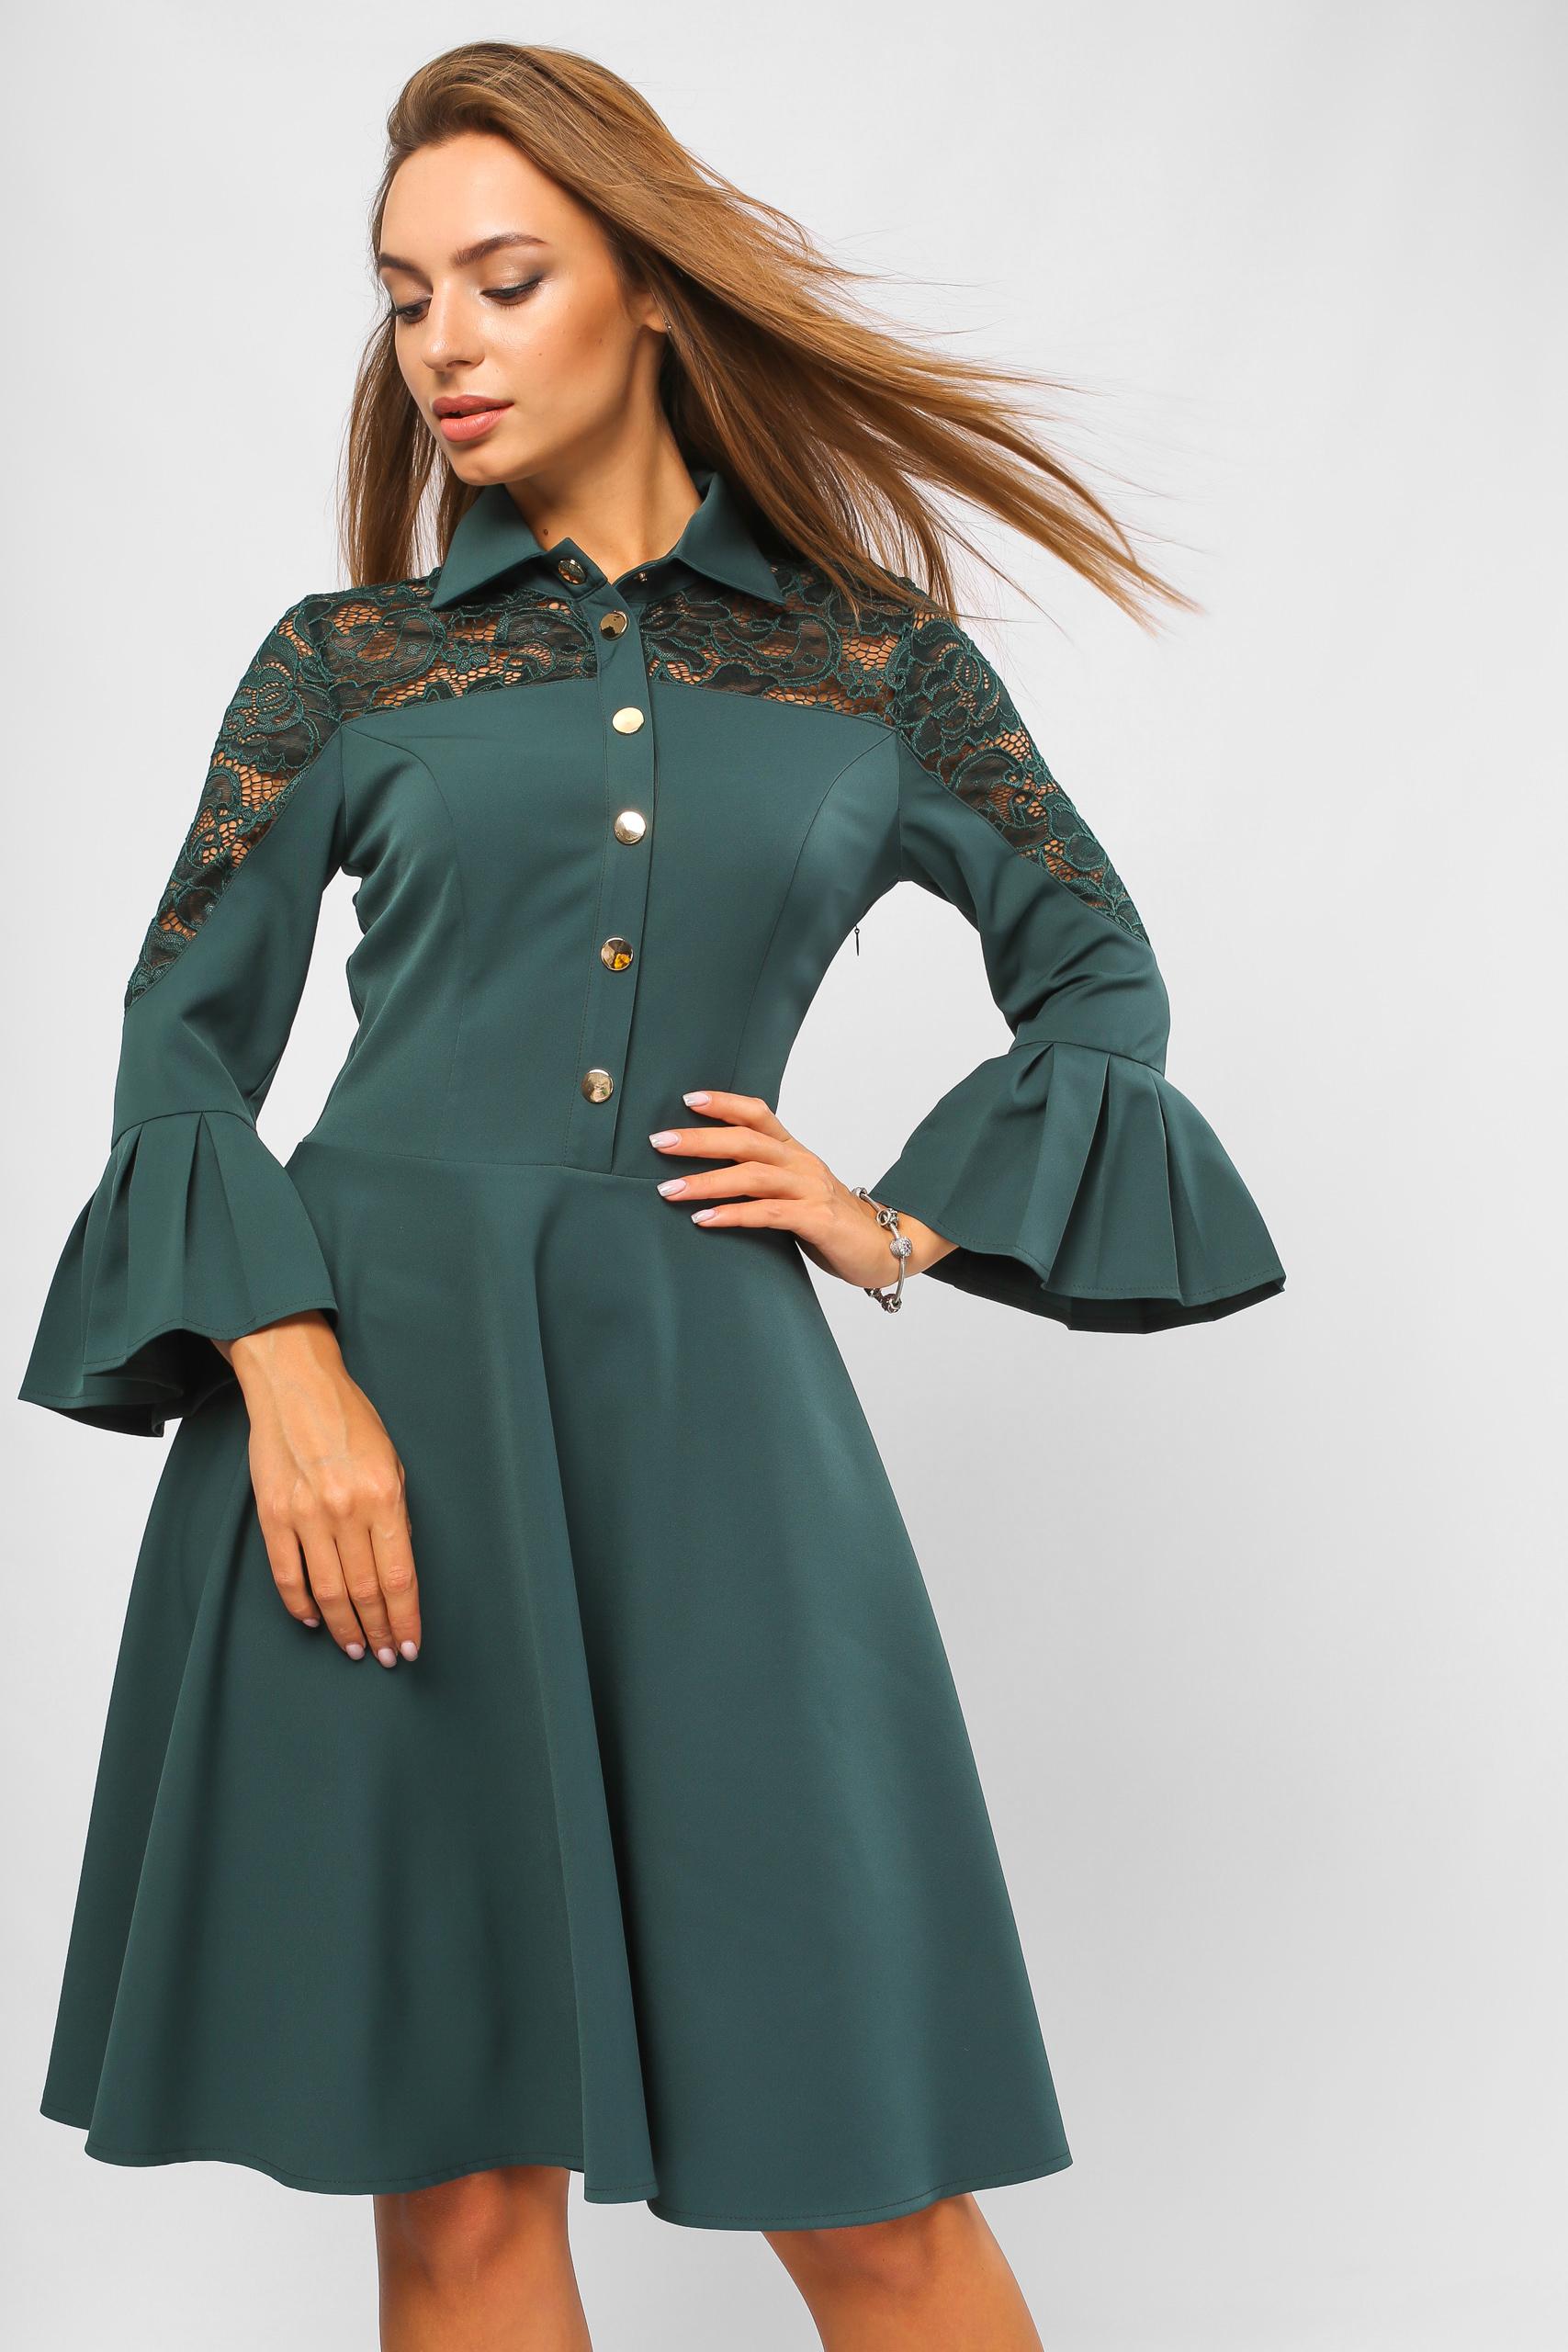 Сукня на кнопках Зелена Lipar